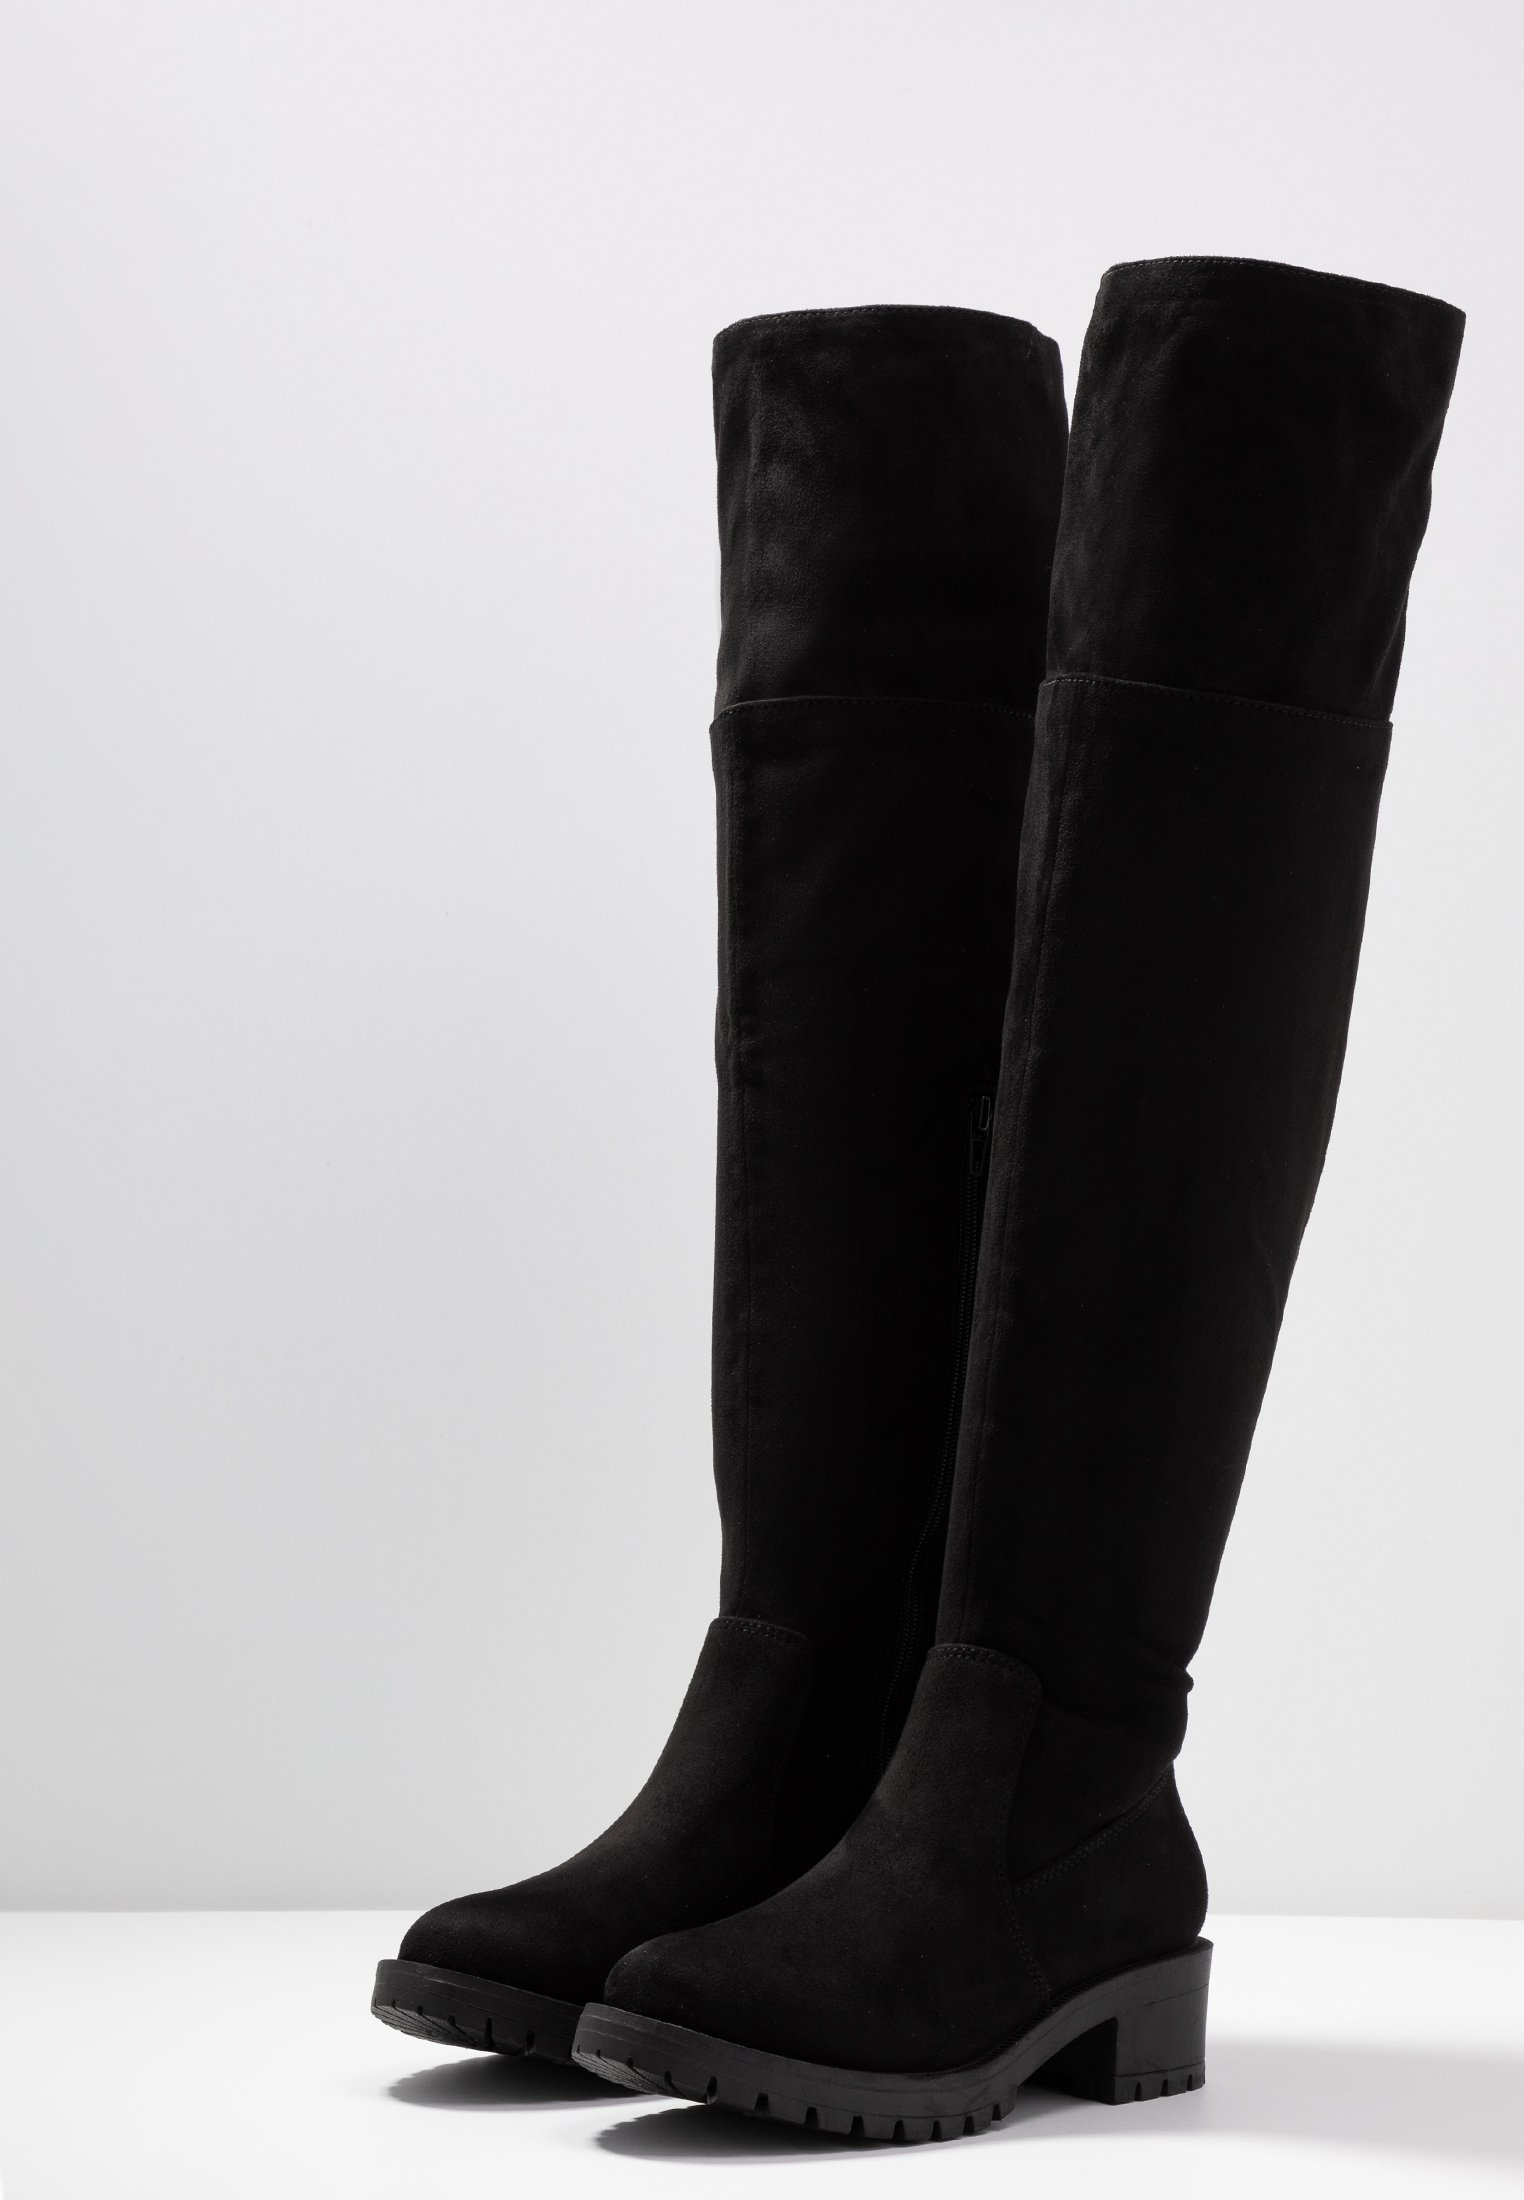 ALDO ARAECIA Overknee laarzen black Zalando.nl